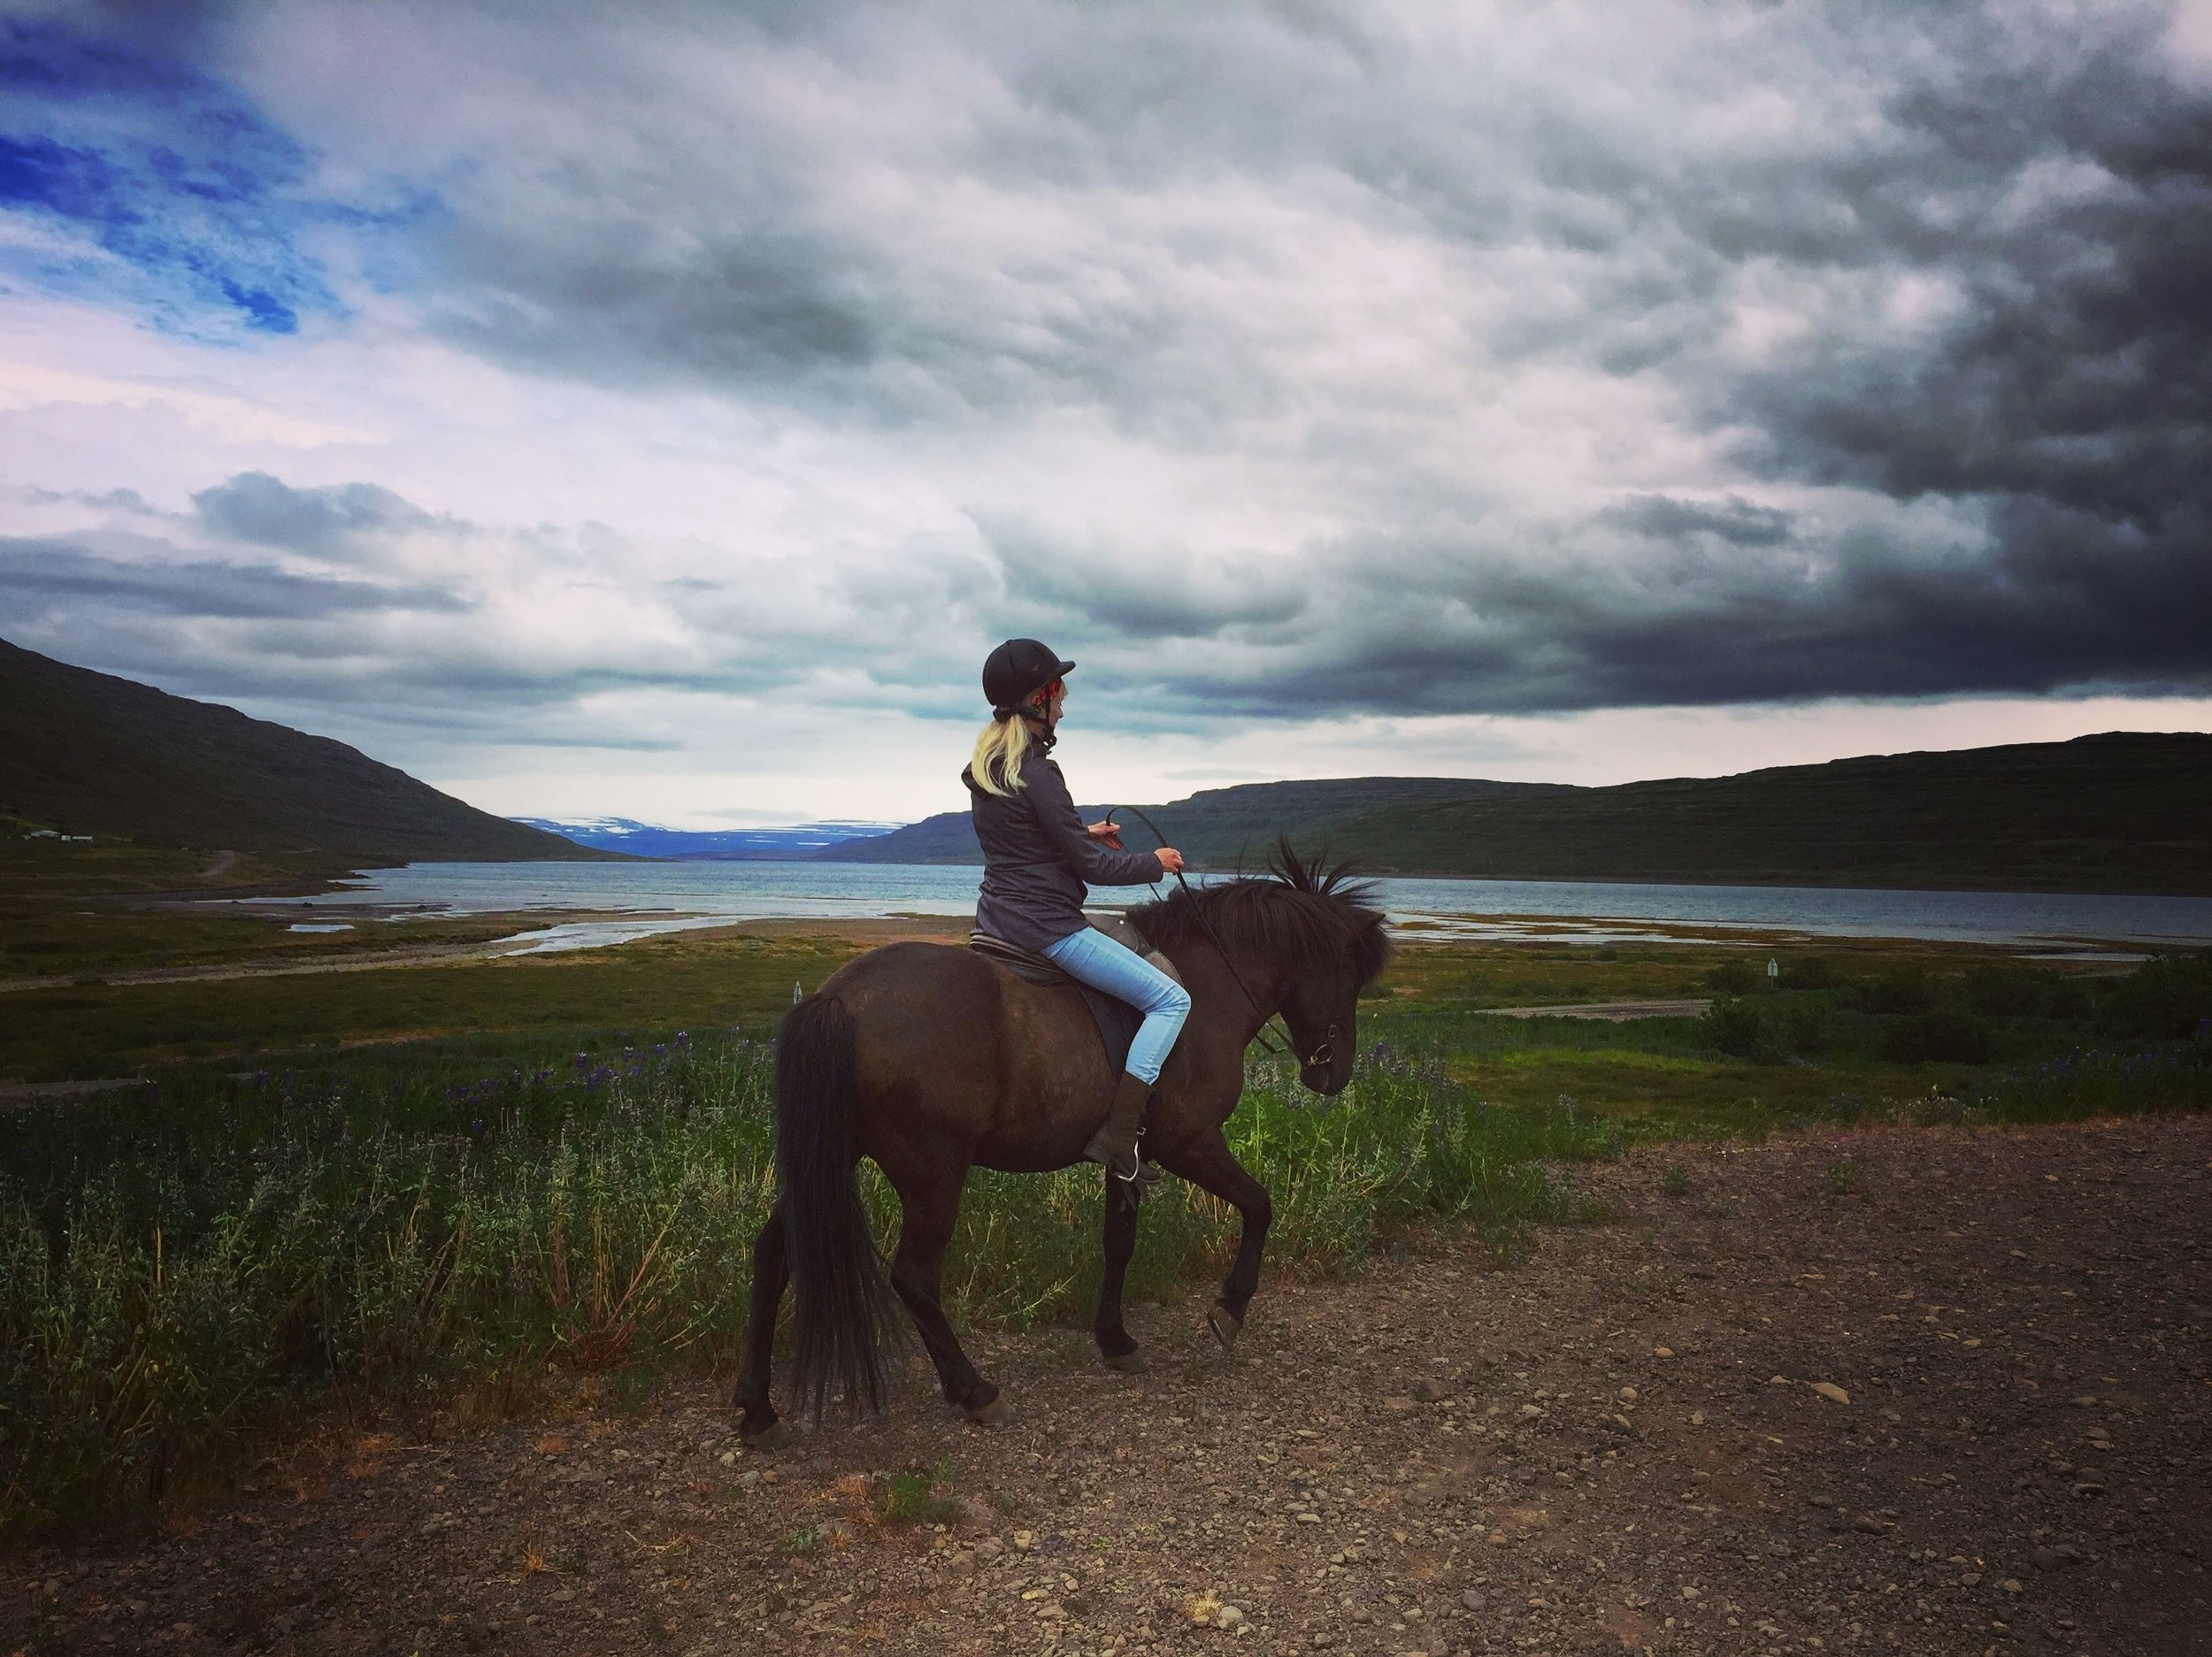 Anne of horse.jpg